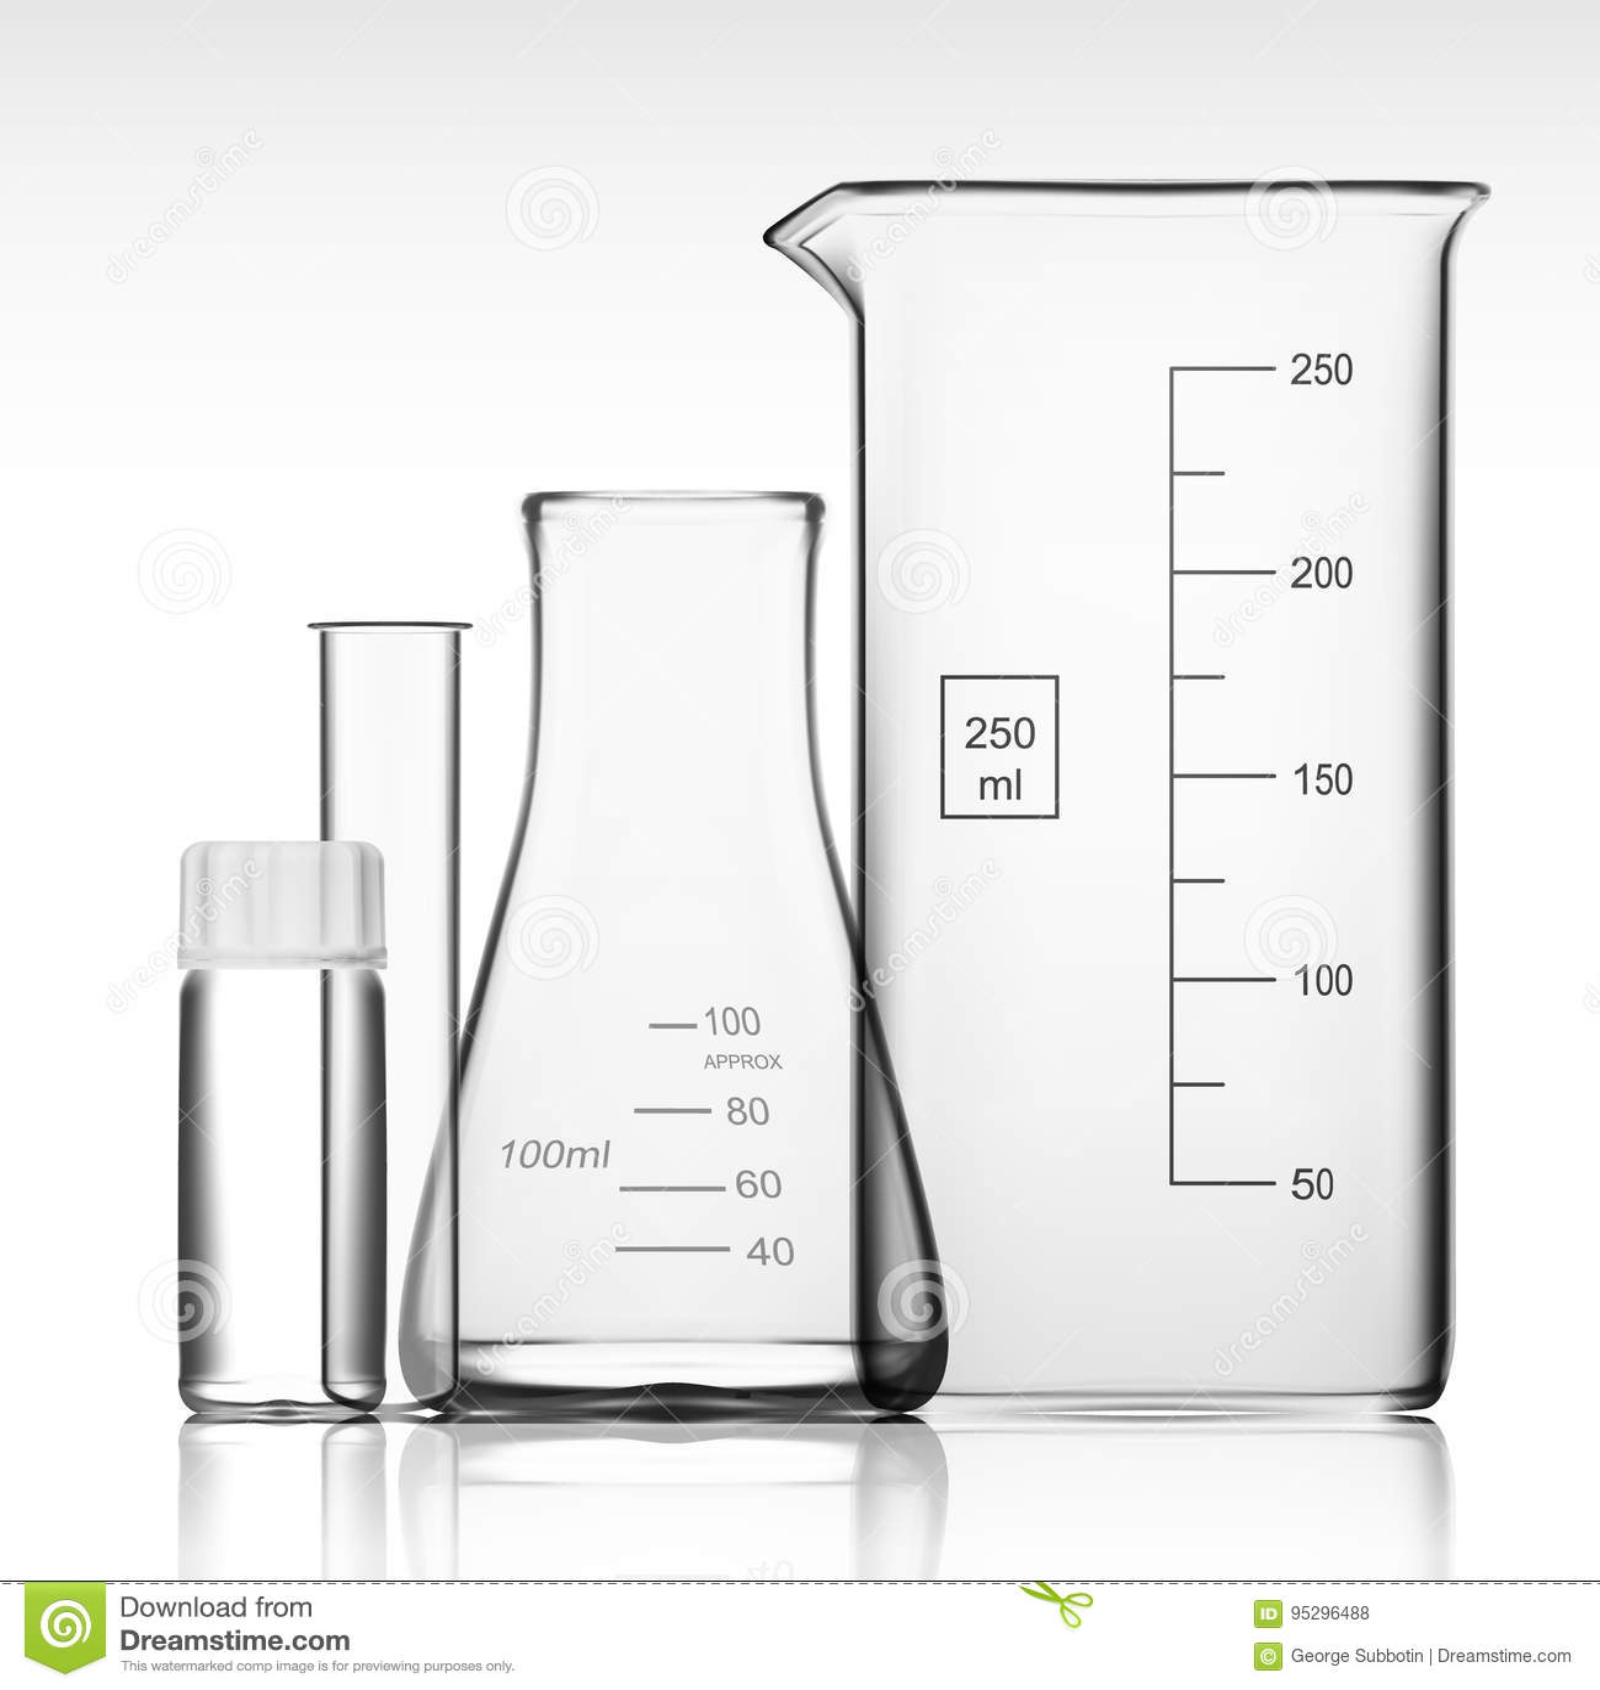 Chemical Laboratory Glassware Or Beaker Glass Equipment Empty Clear Test Tube Stock Photo